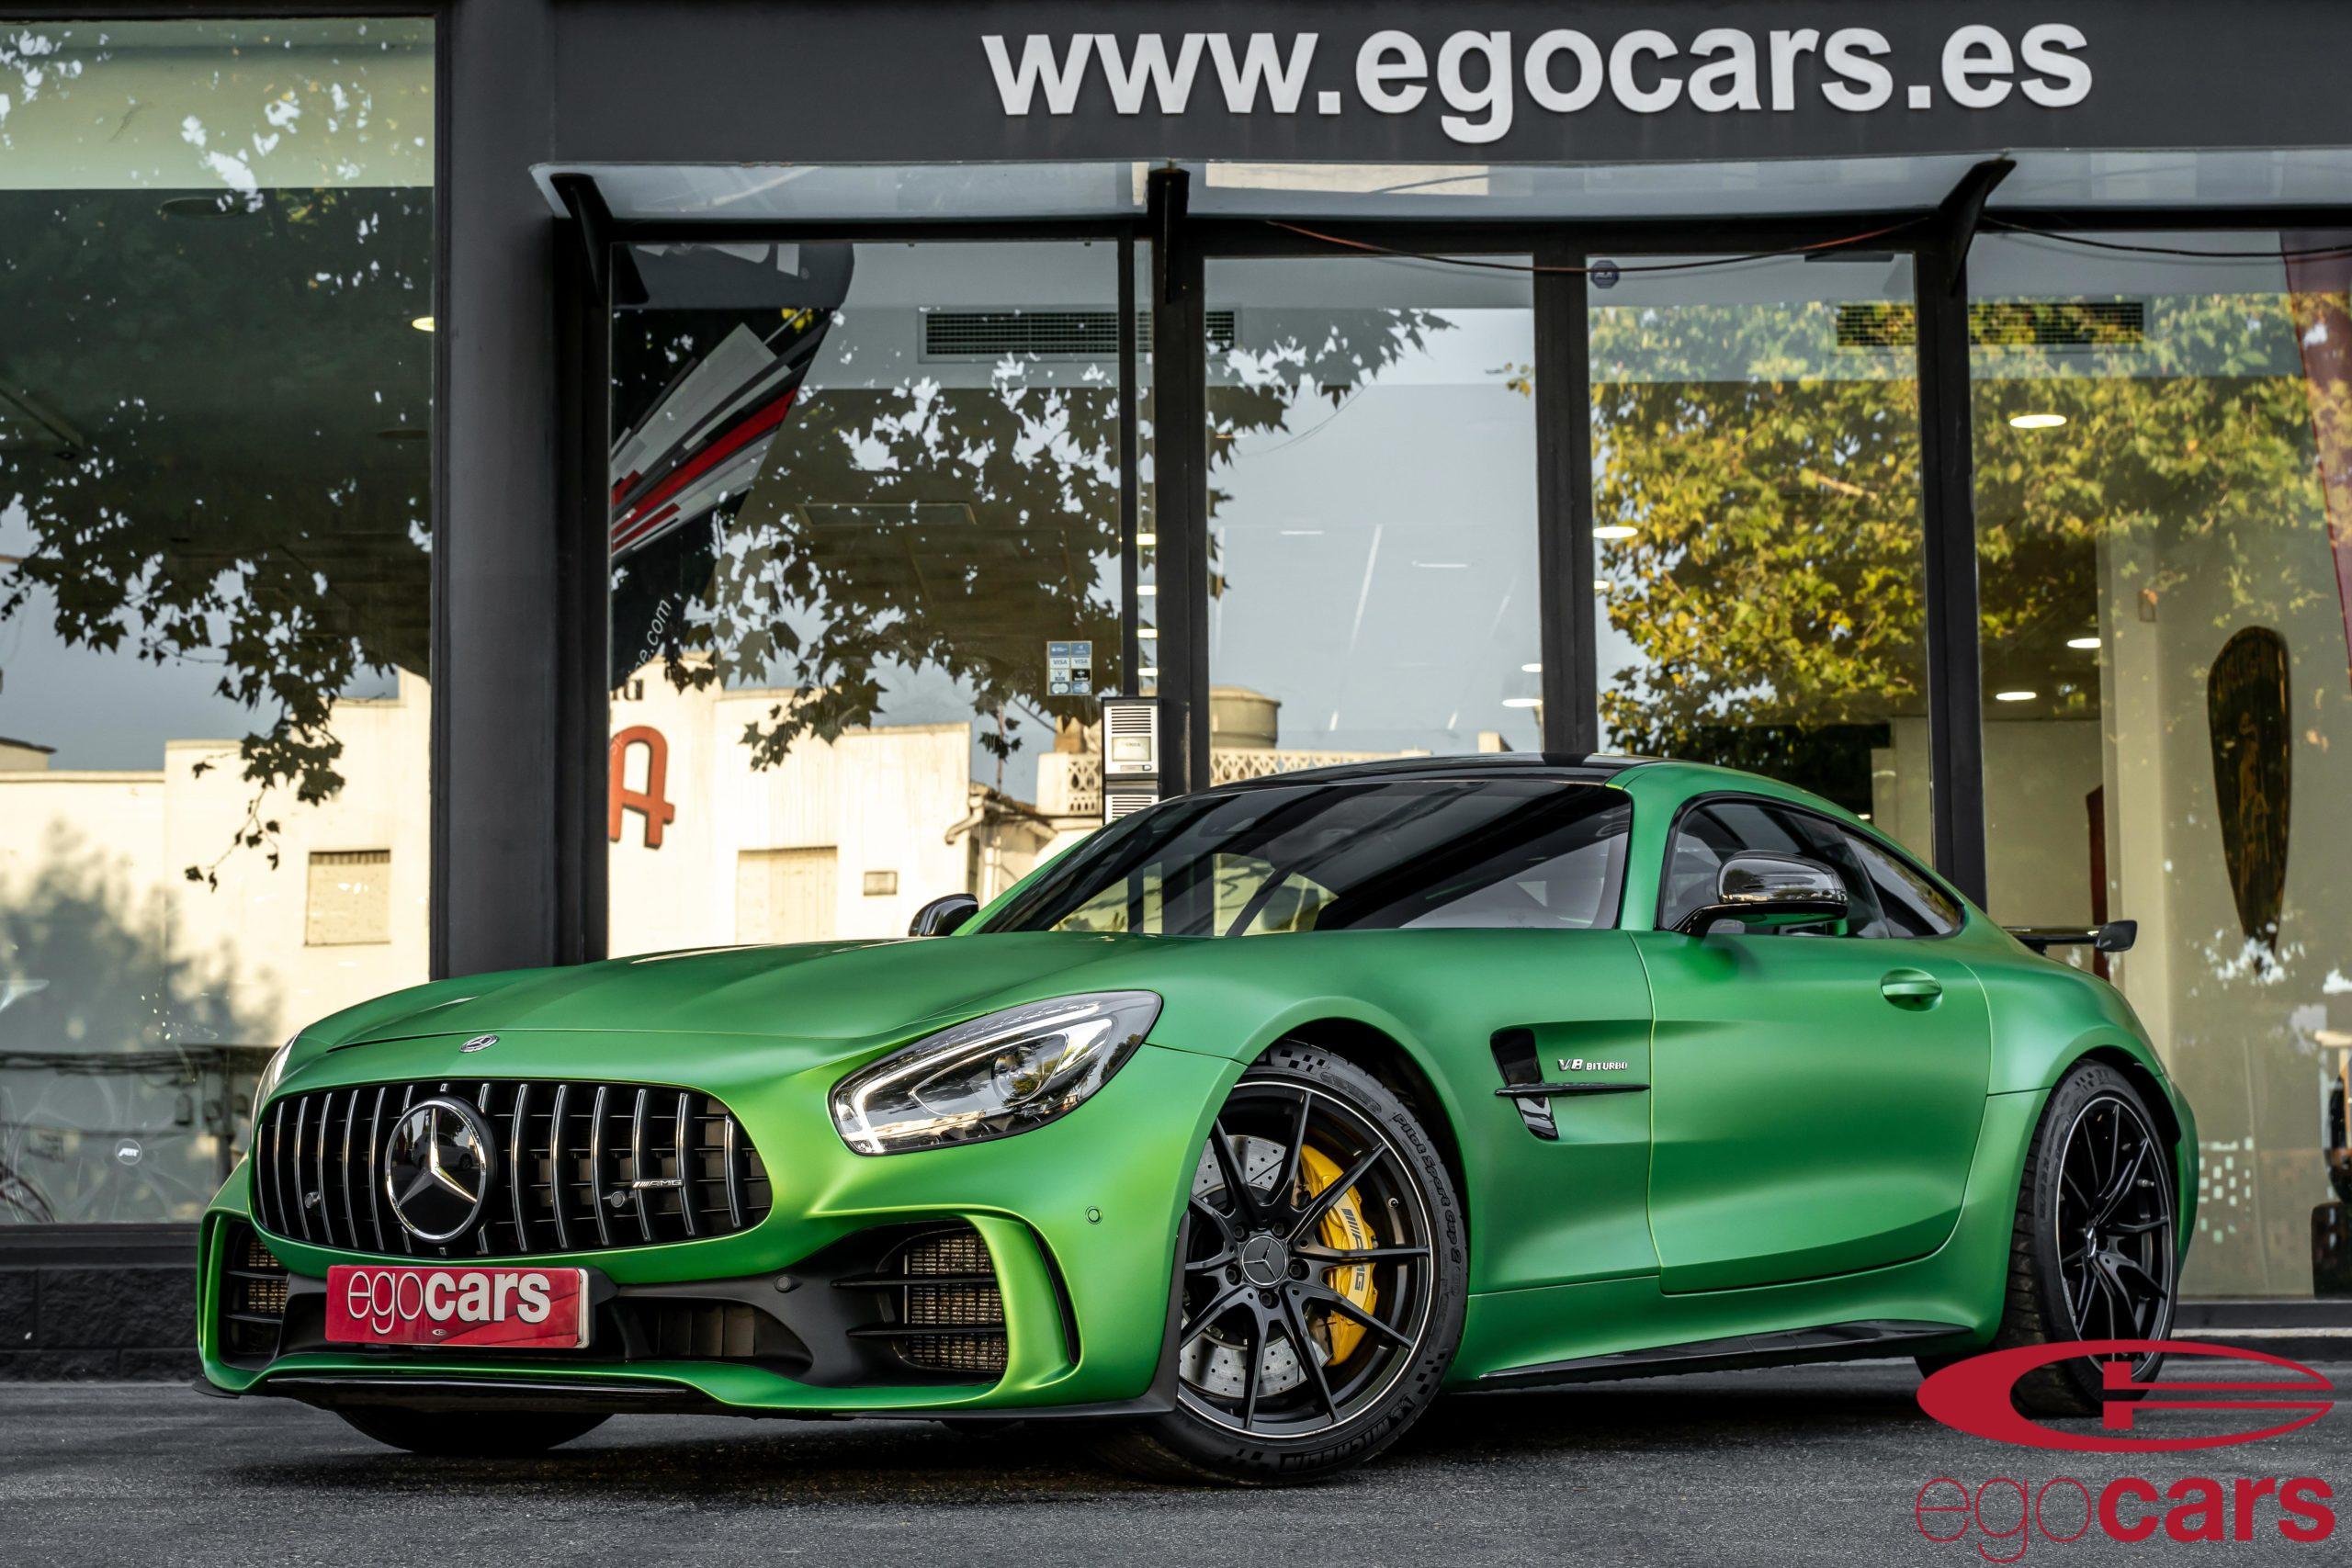 AMG GTR GREEN MAGNO EGOCARS_1